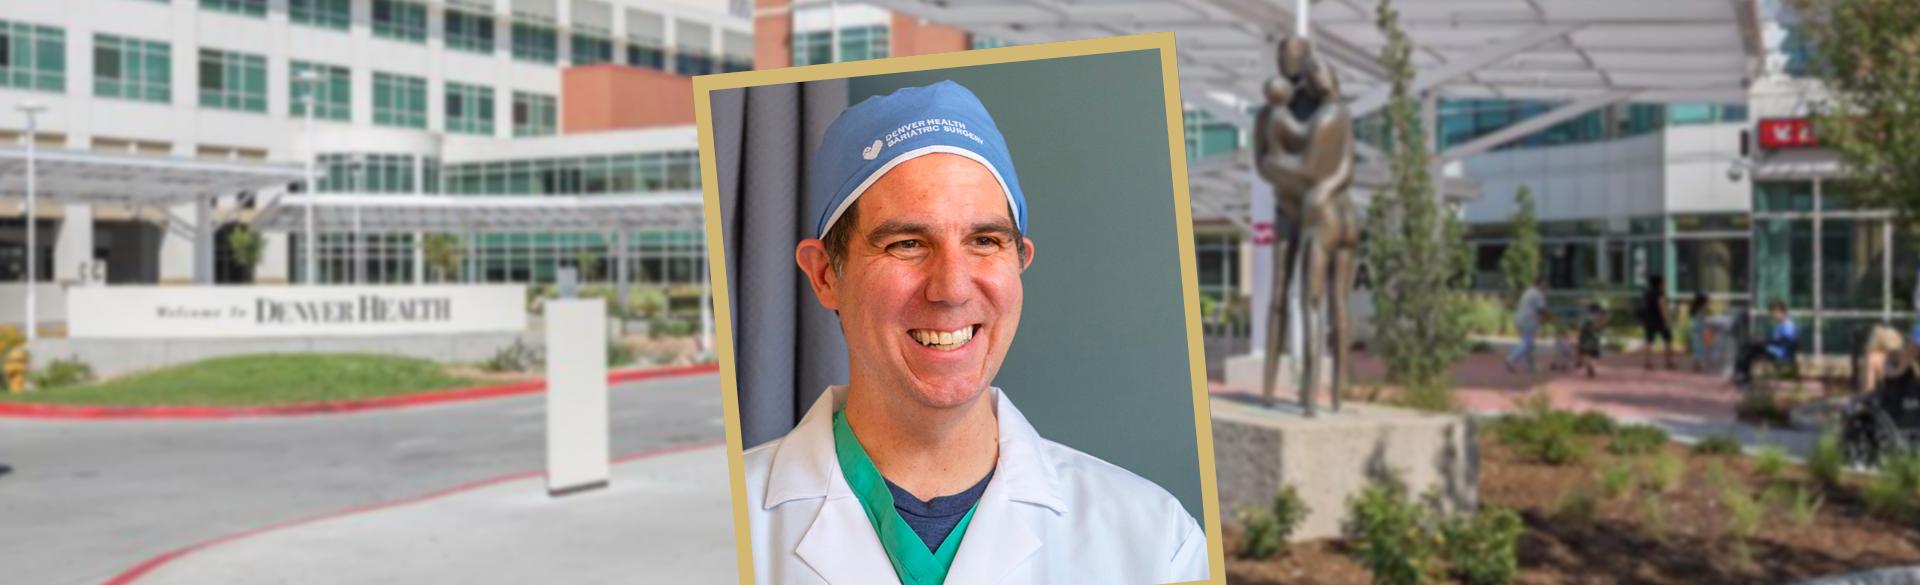 Denver Health Bariatric Surgery Public Health Initiative | CU School of Medicine Department of Surgery | Aurora, CO